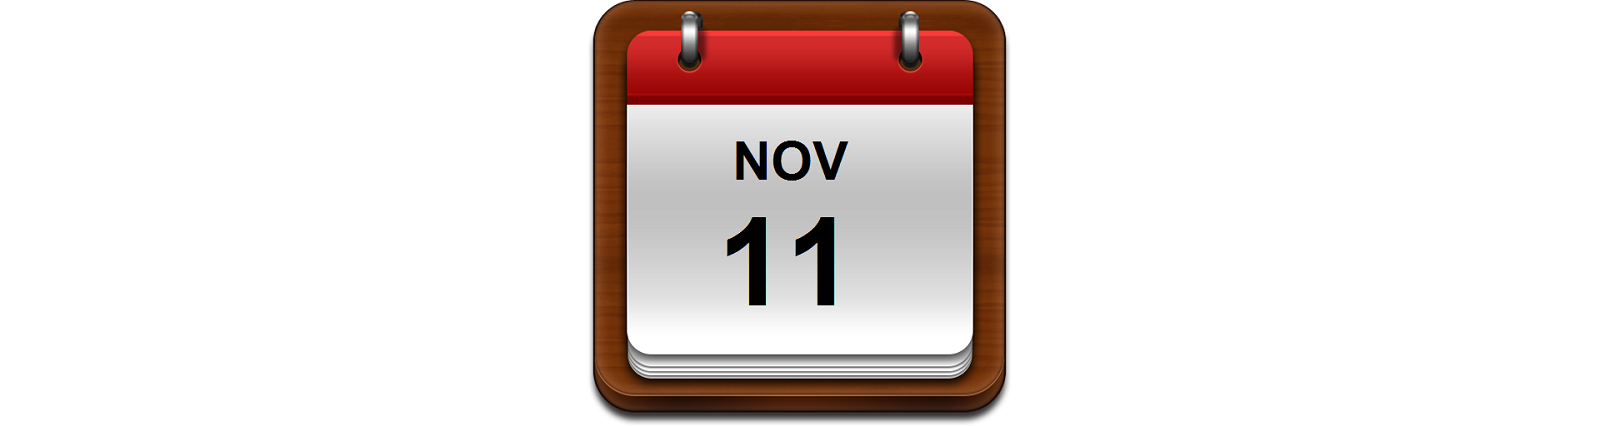 11 novembre 2016 calendrier alibaba aliexpress